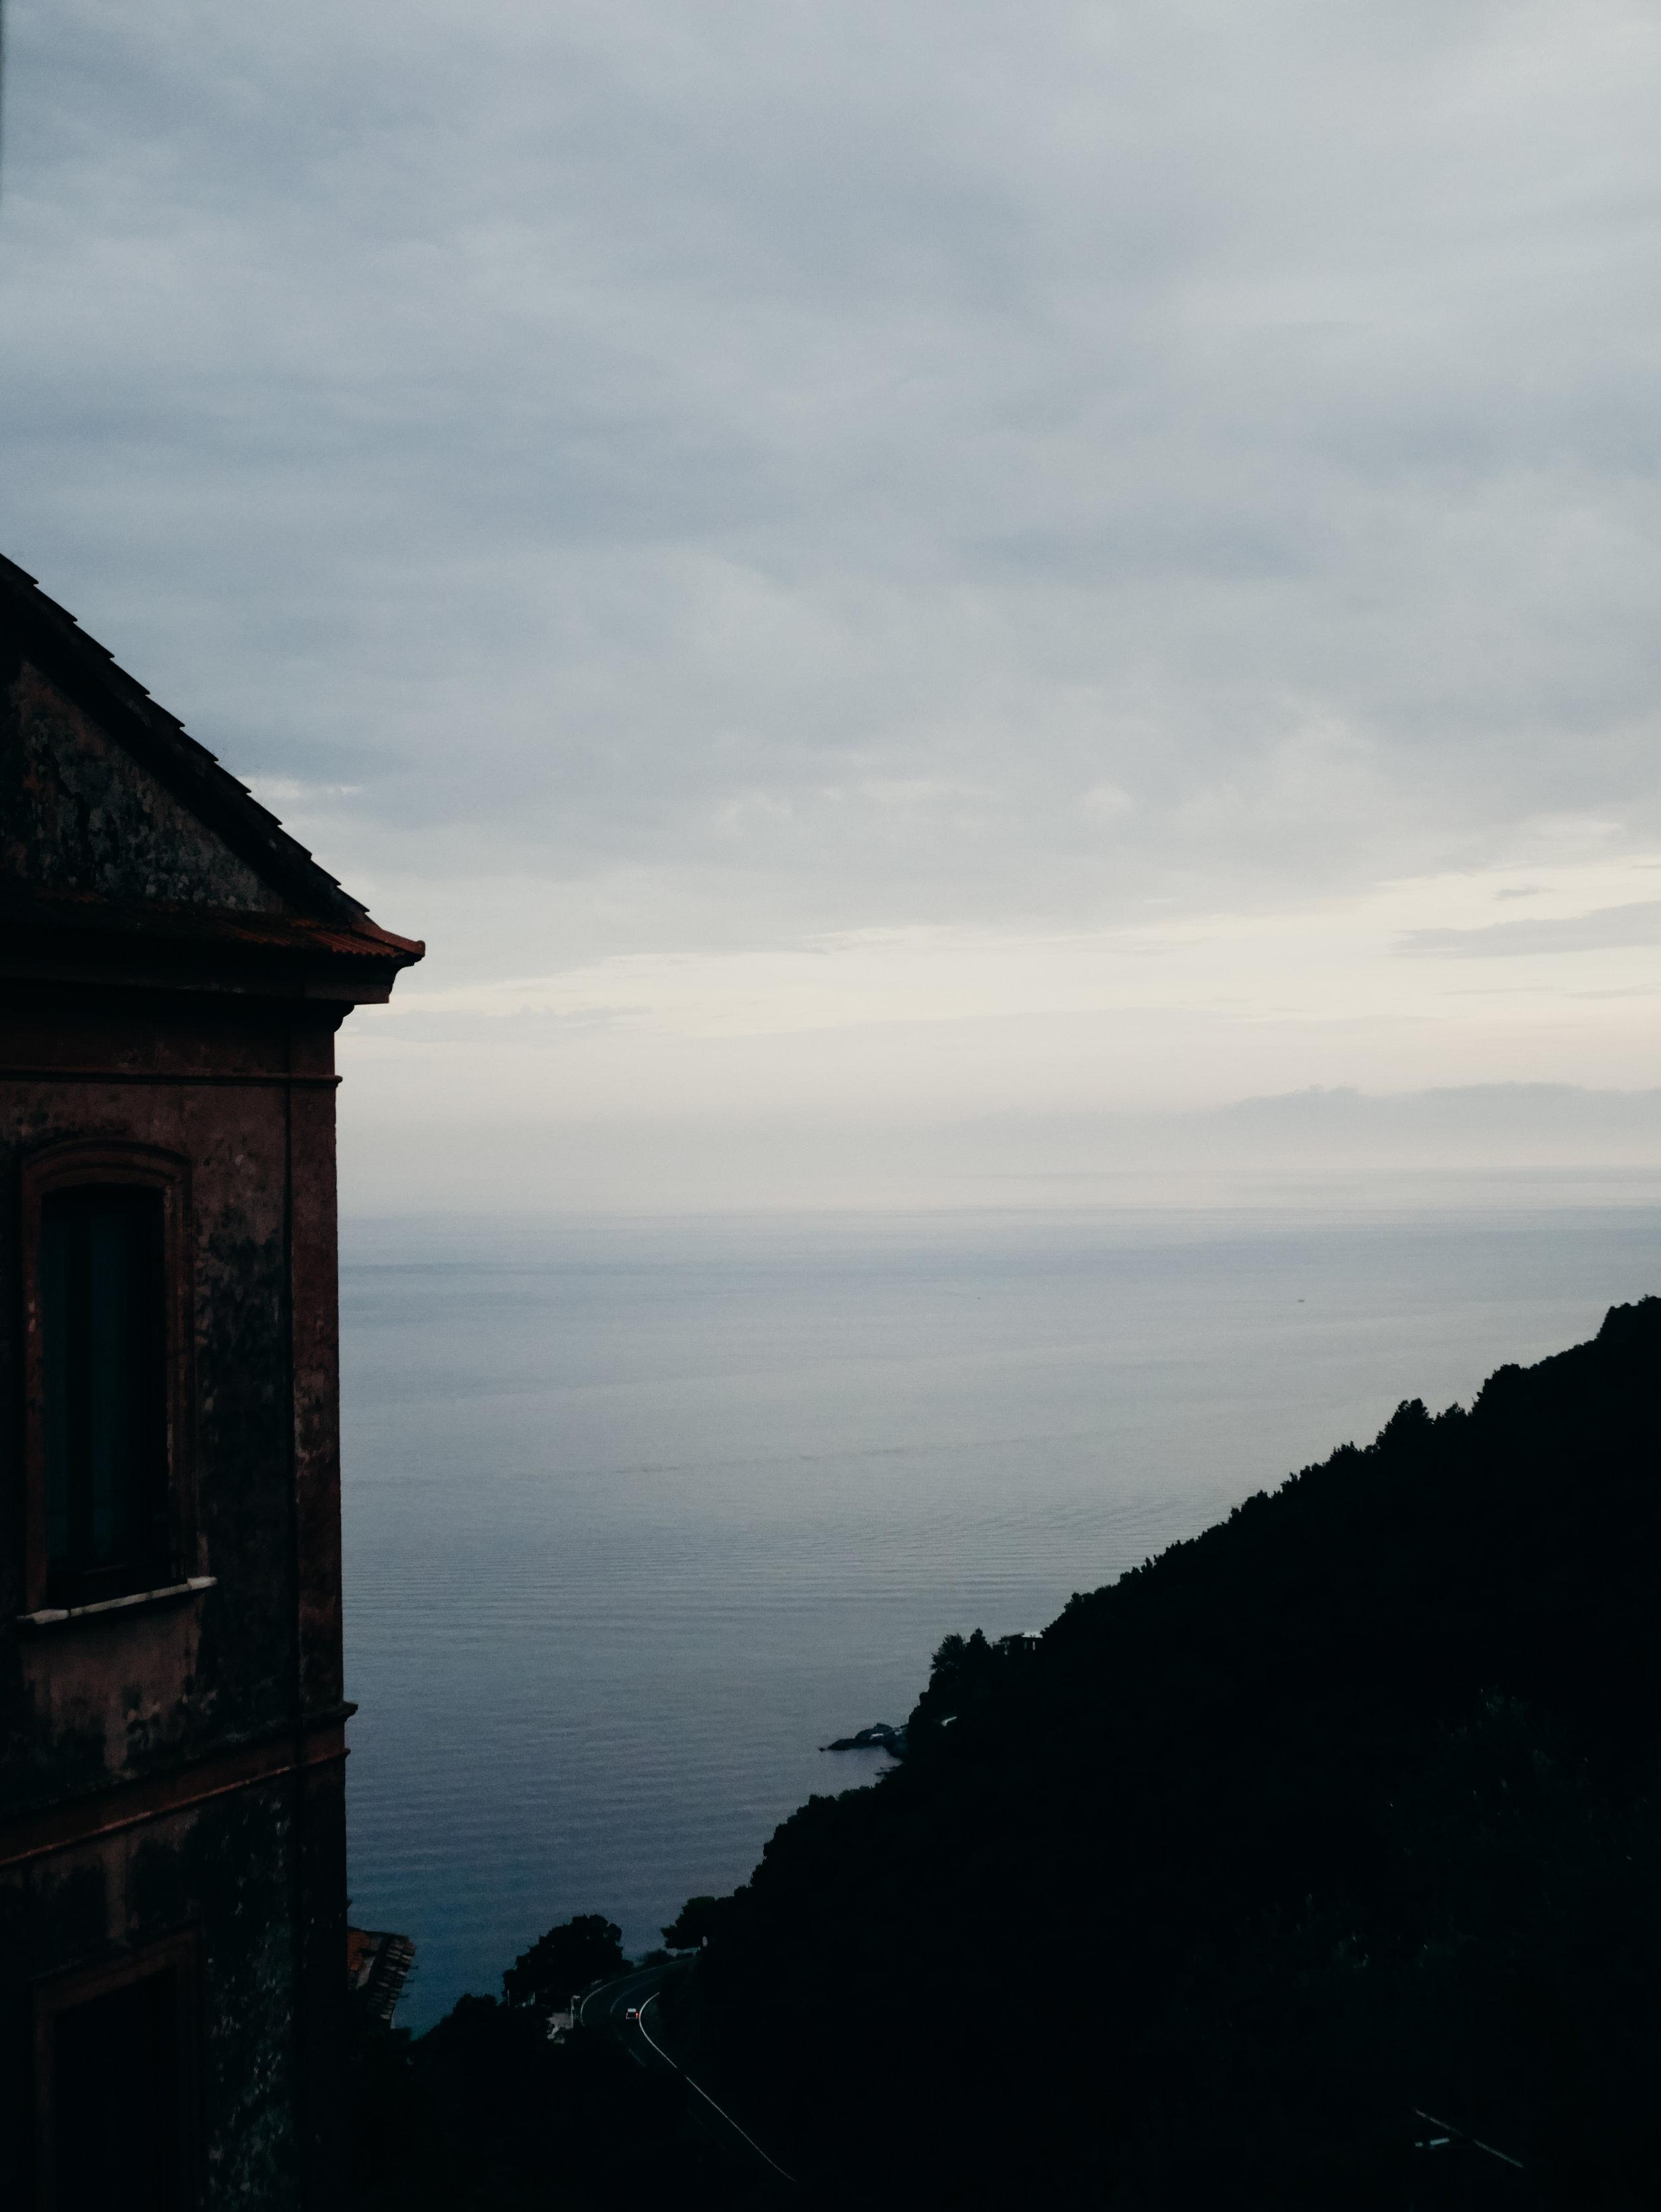 Vietri sul Mare on the Amalfi Coast